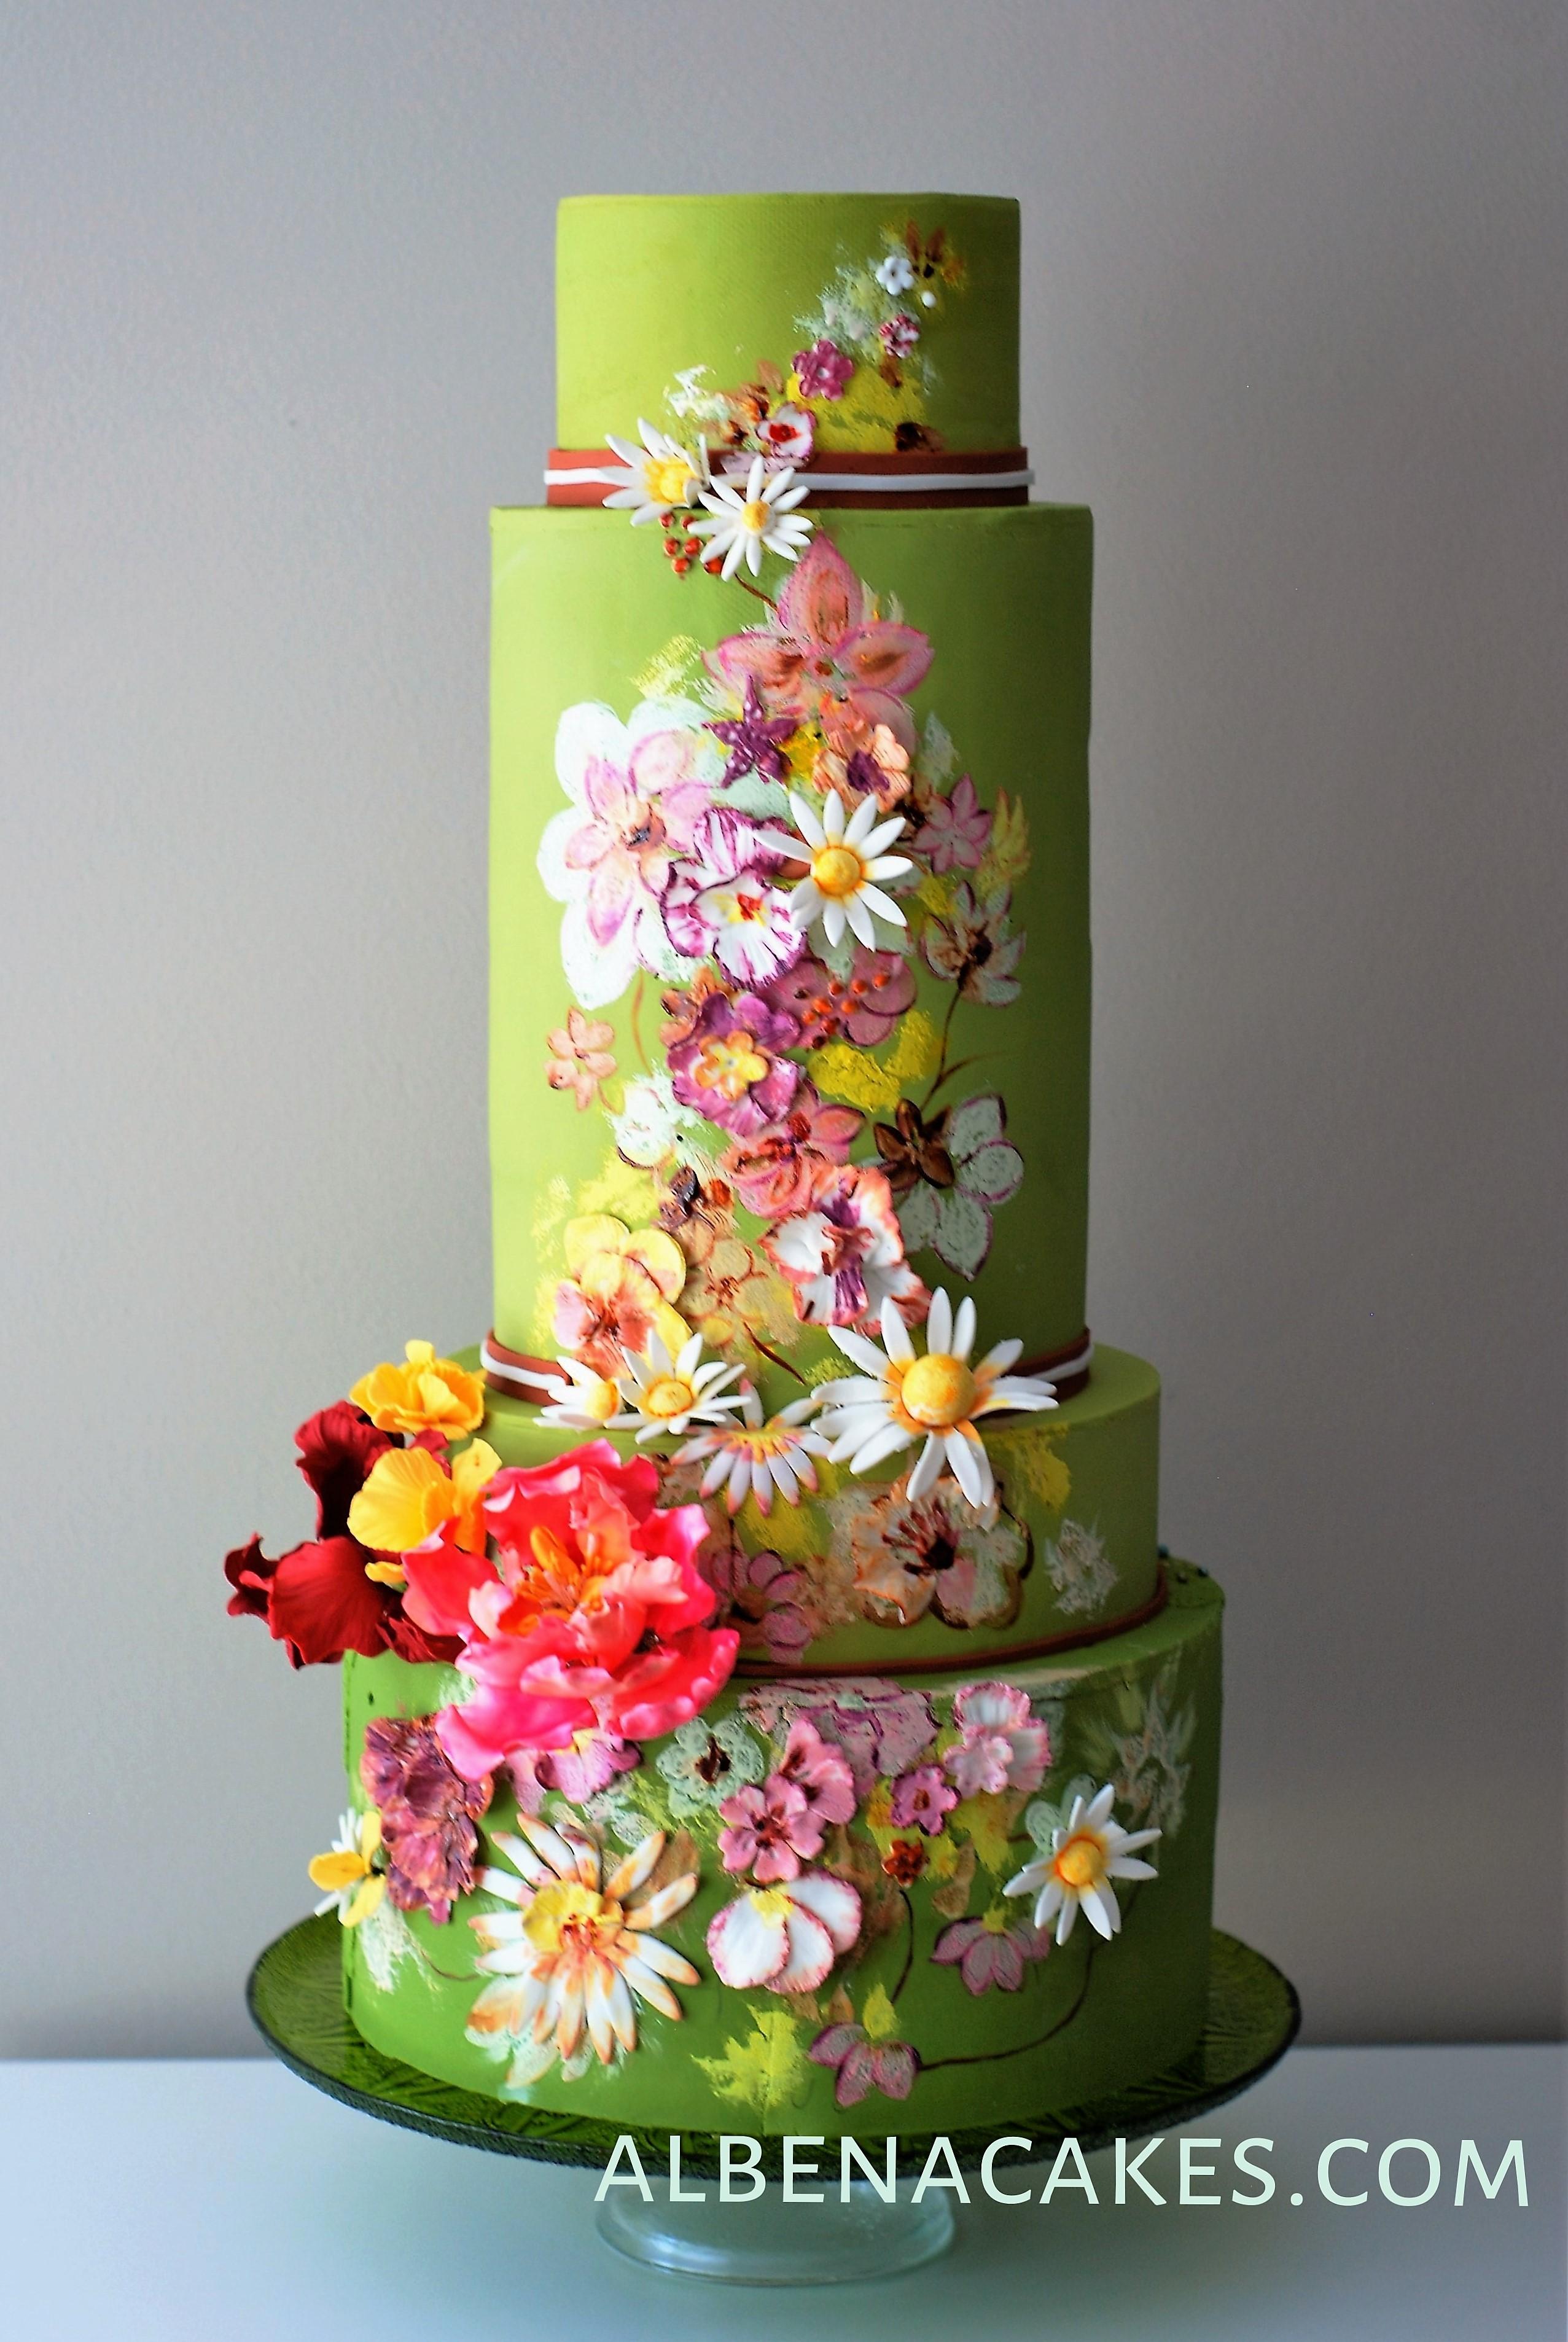 Albena-Petrova-Albenas-Custom-Cakes-Wedding-Elegant-10.jpg#asset:10296